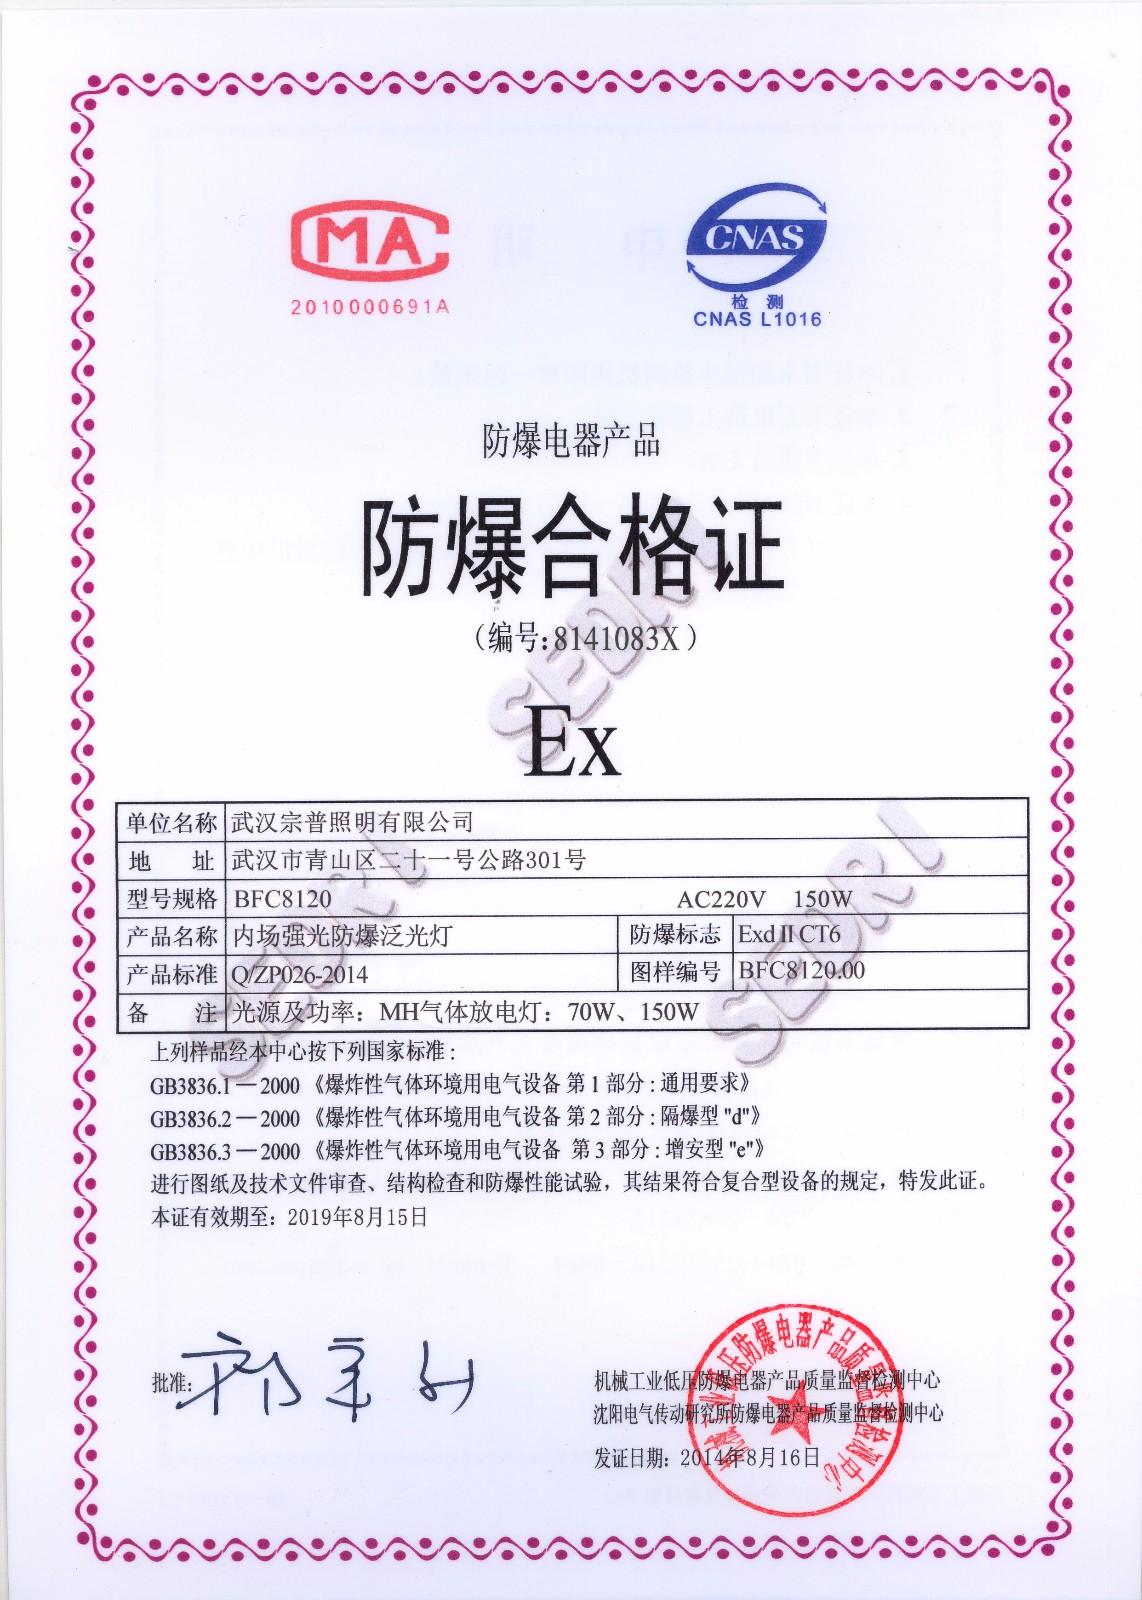 bfc8120-宗普雷竞技充值证书.jpg